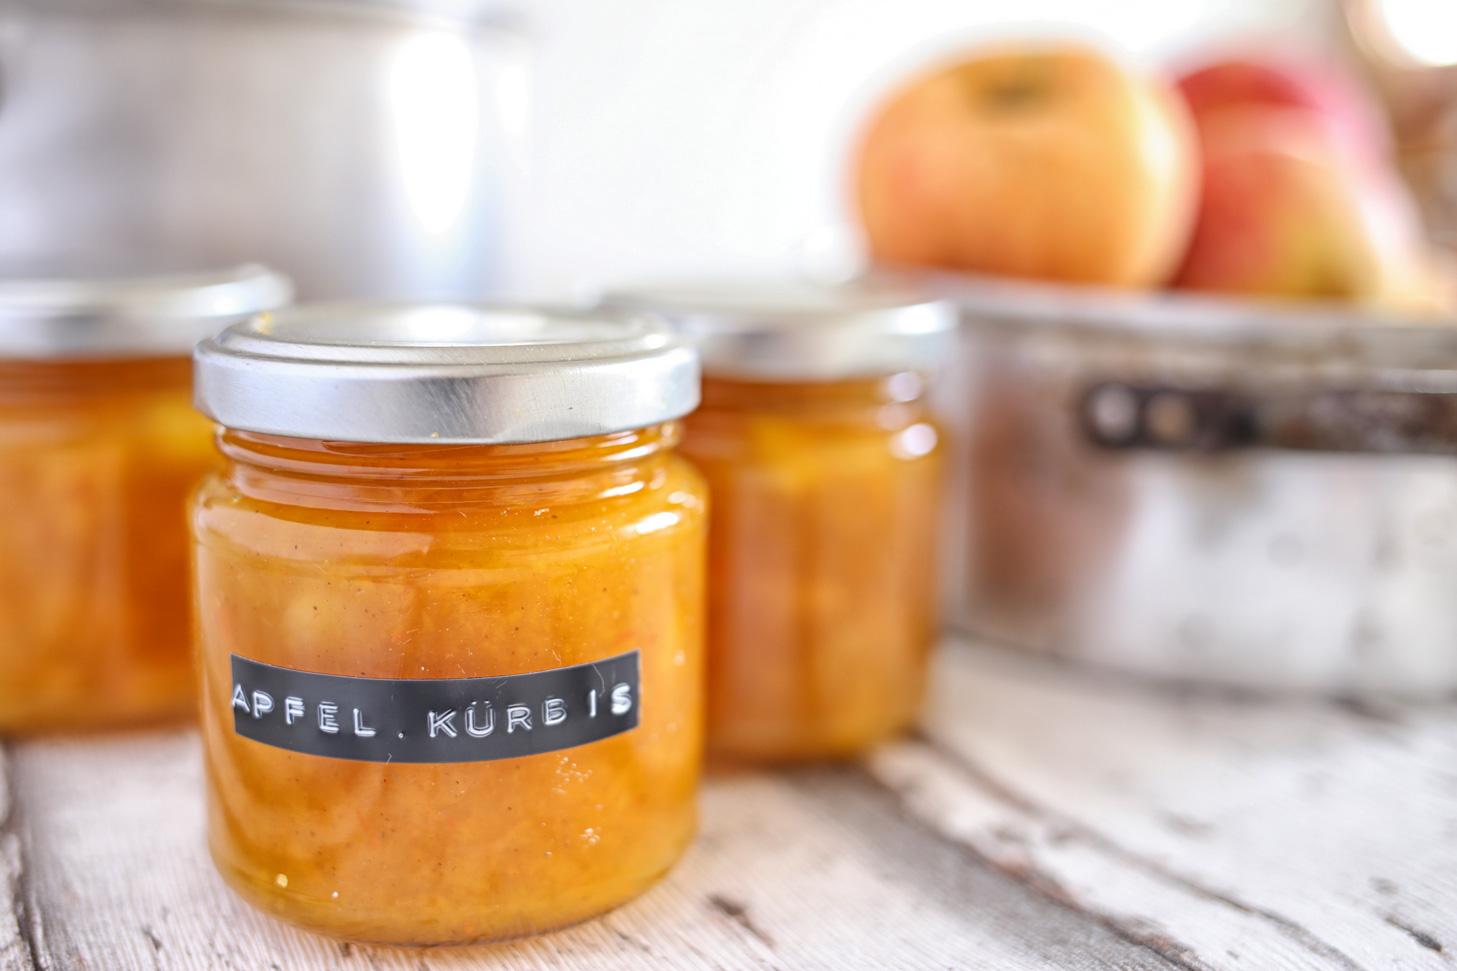 Apfel-Kuerbis-Marmelade